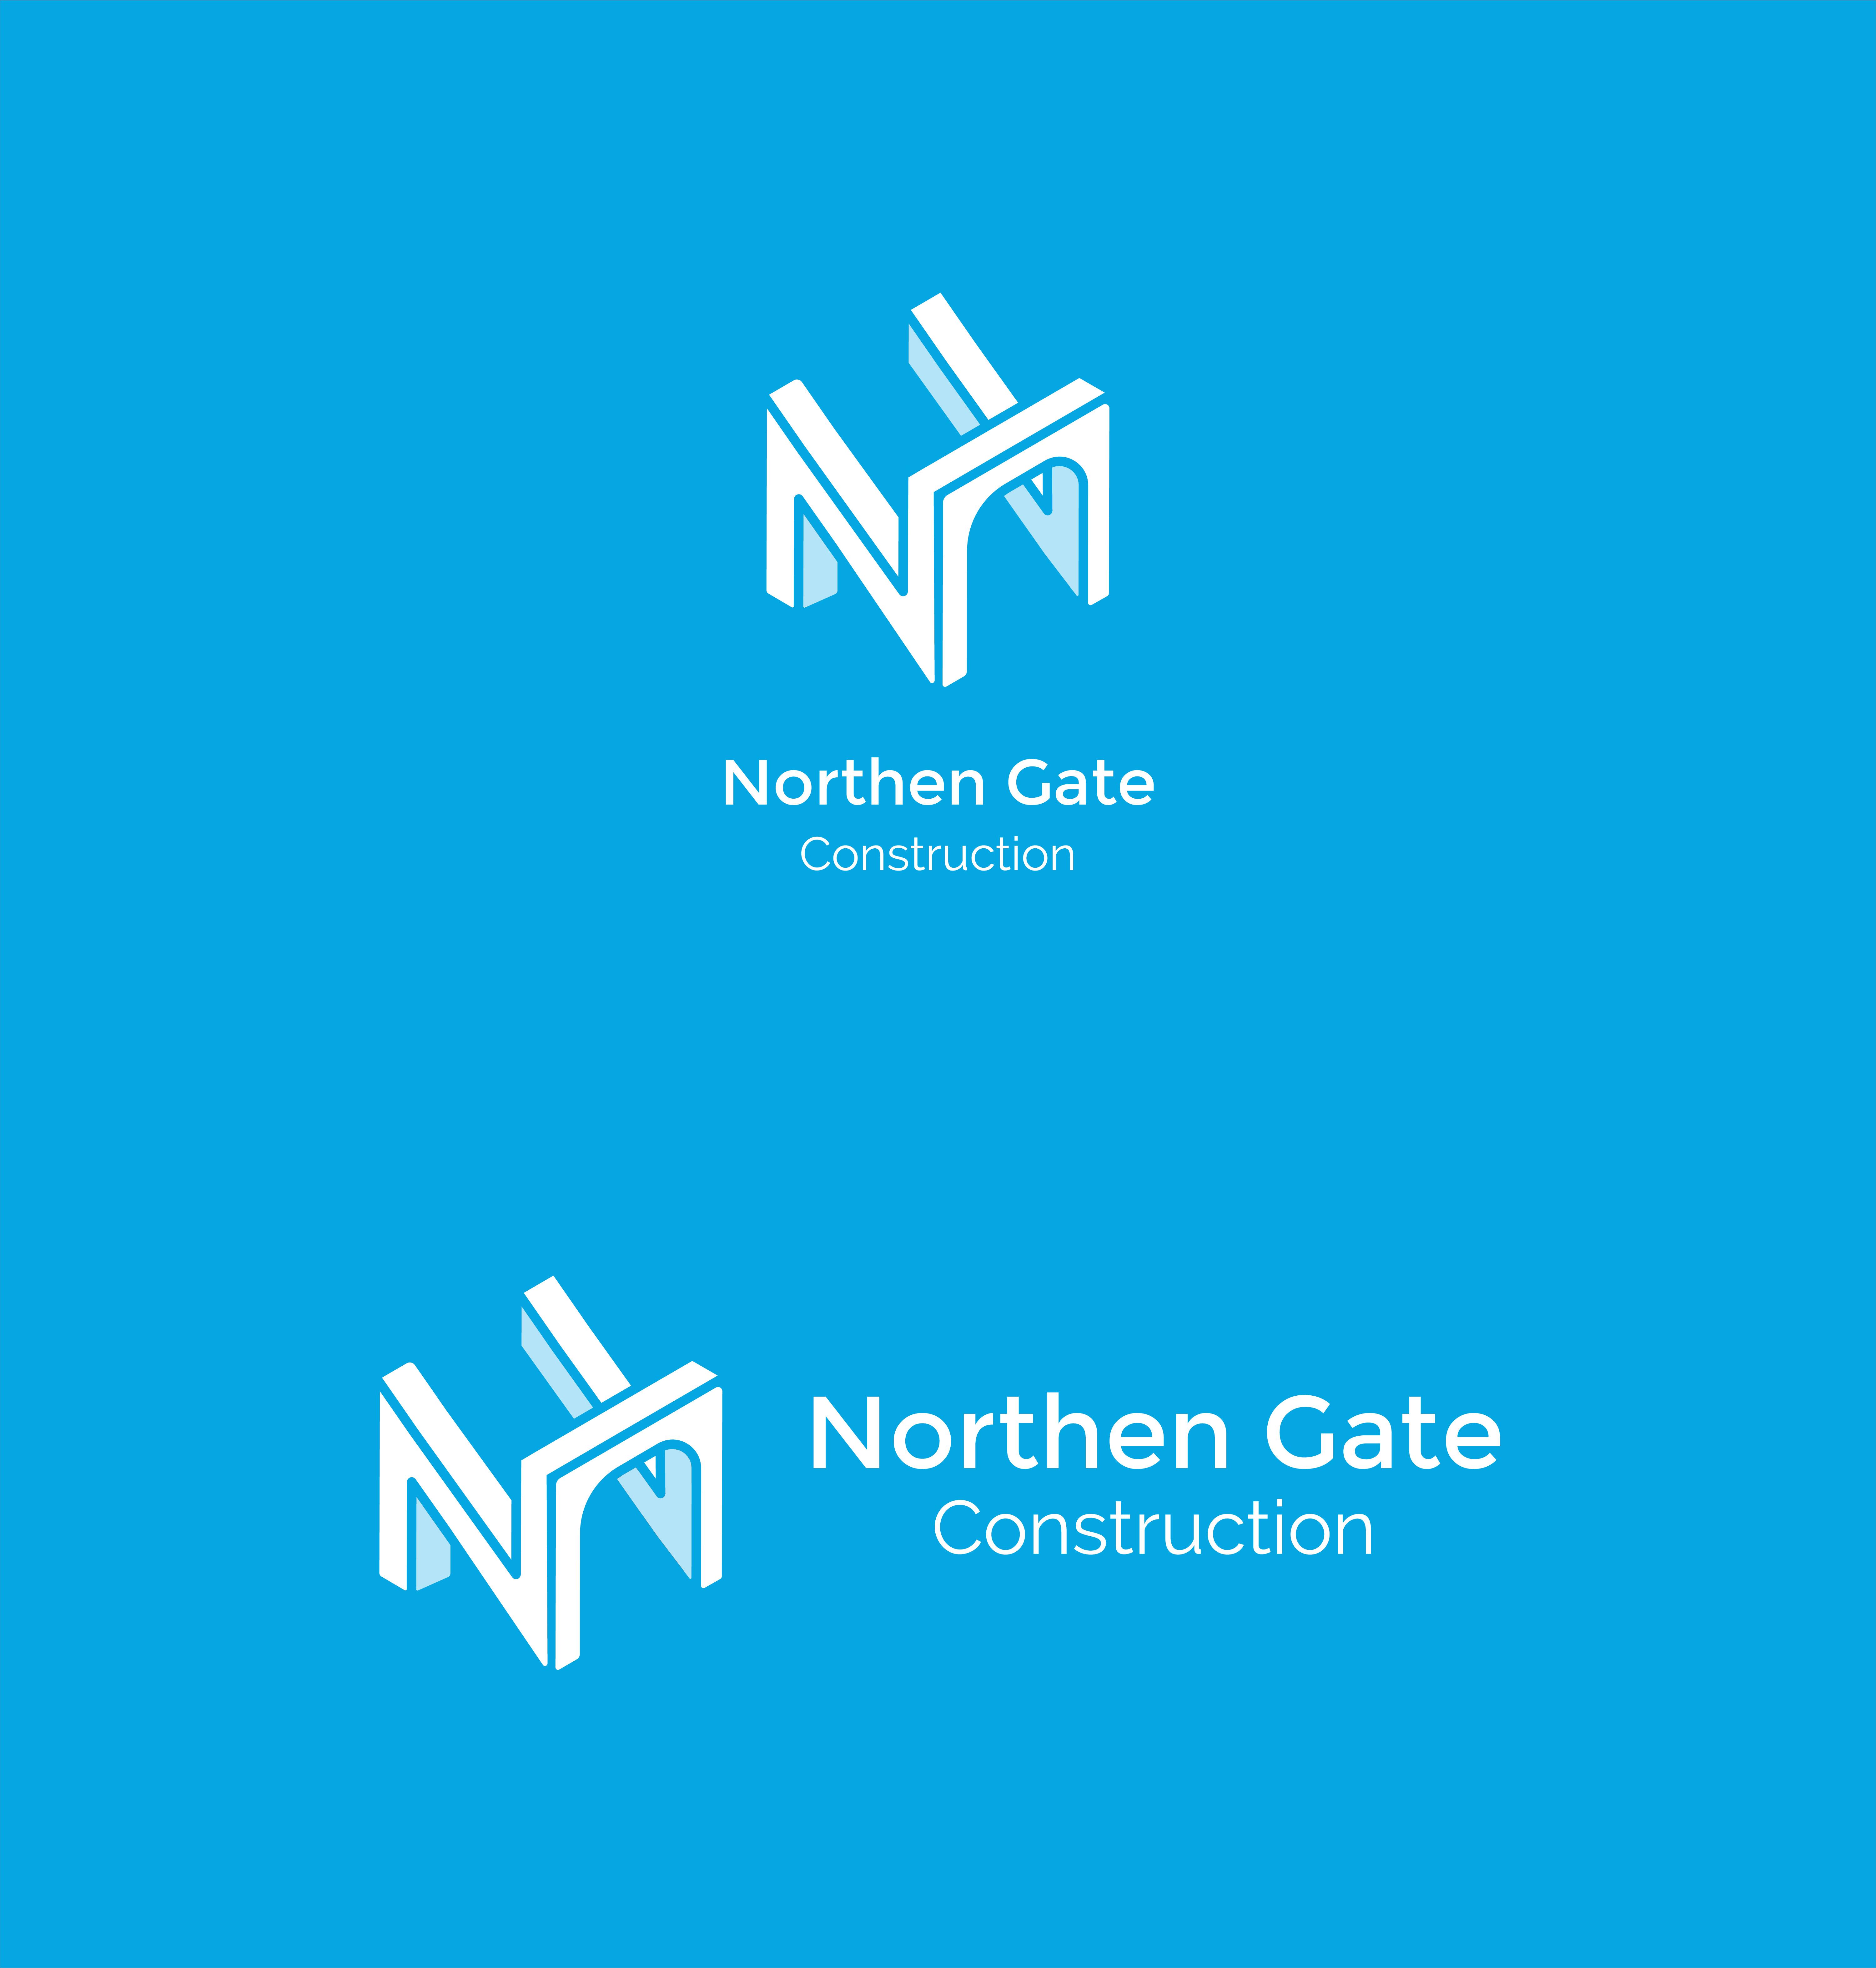 Letter N - Construction Gate Bridge Logo Logo Template example image 3